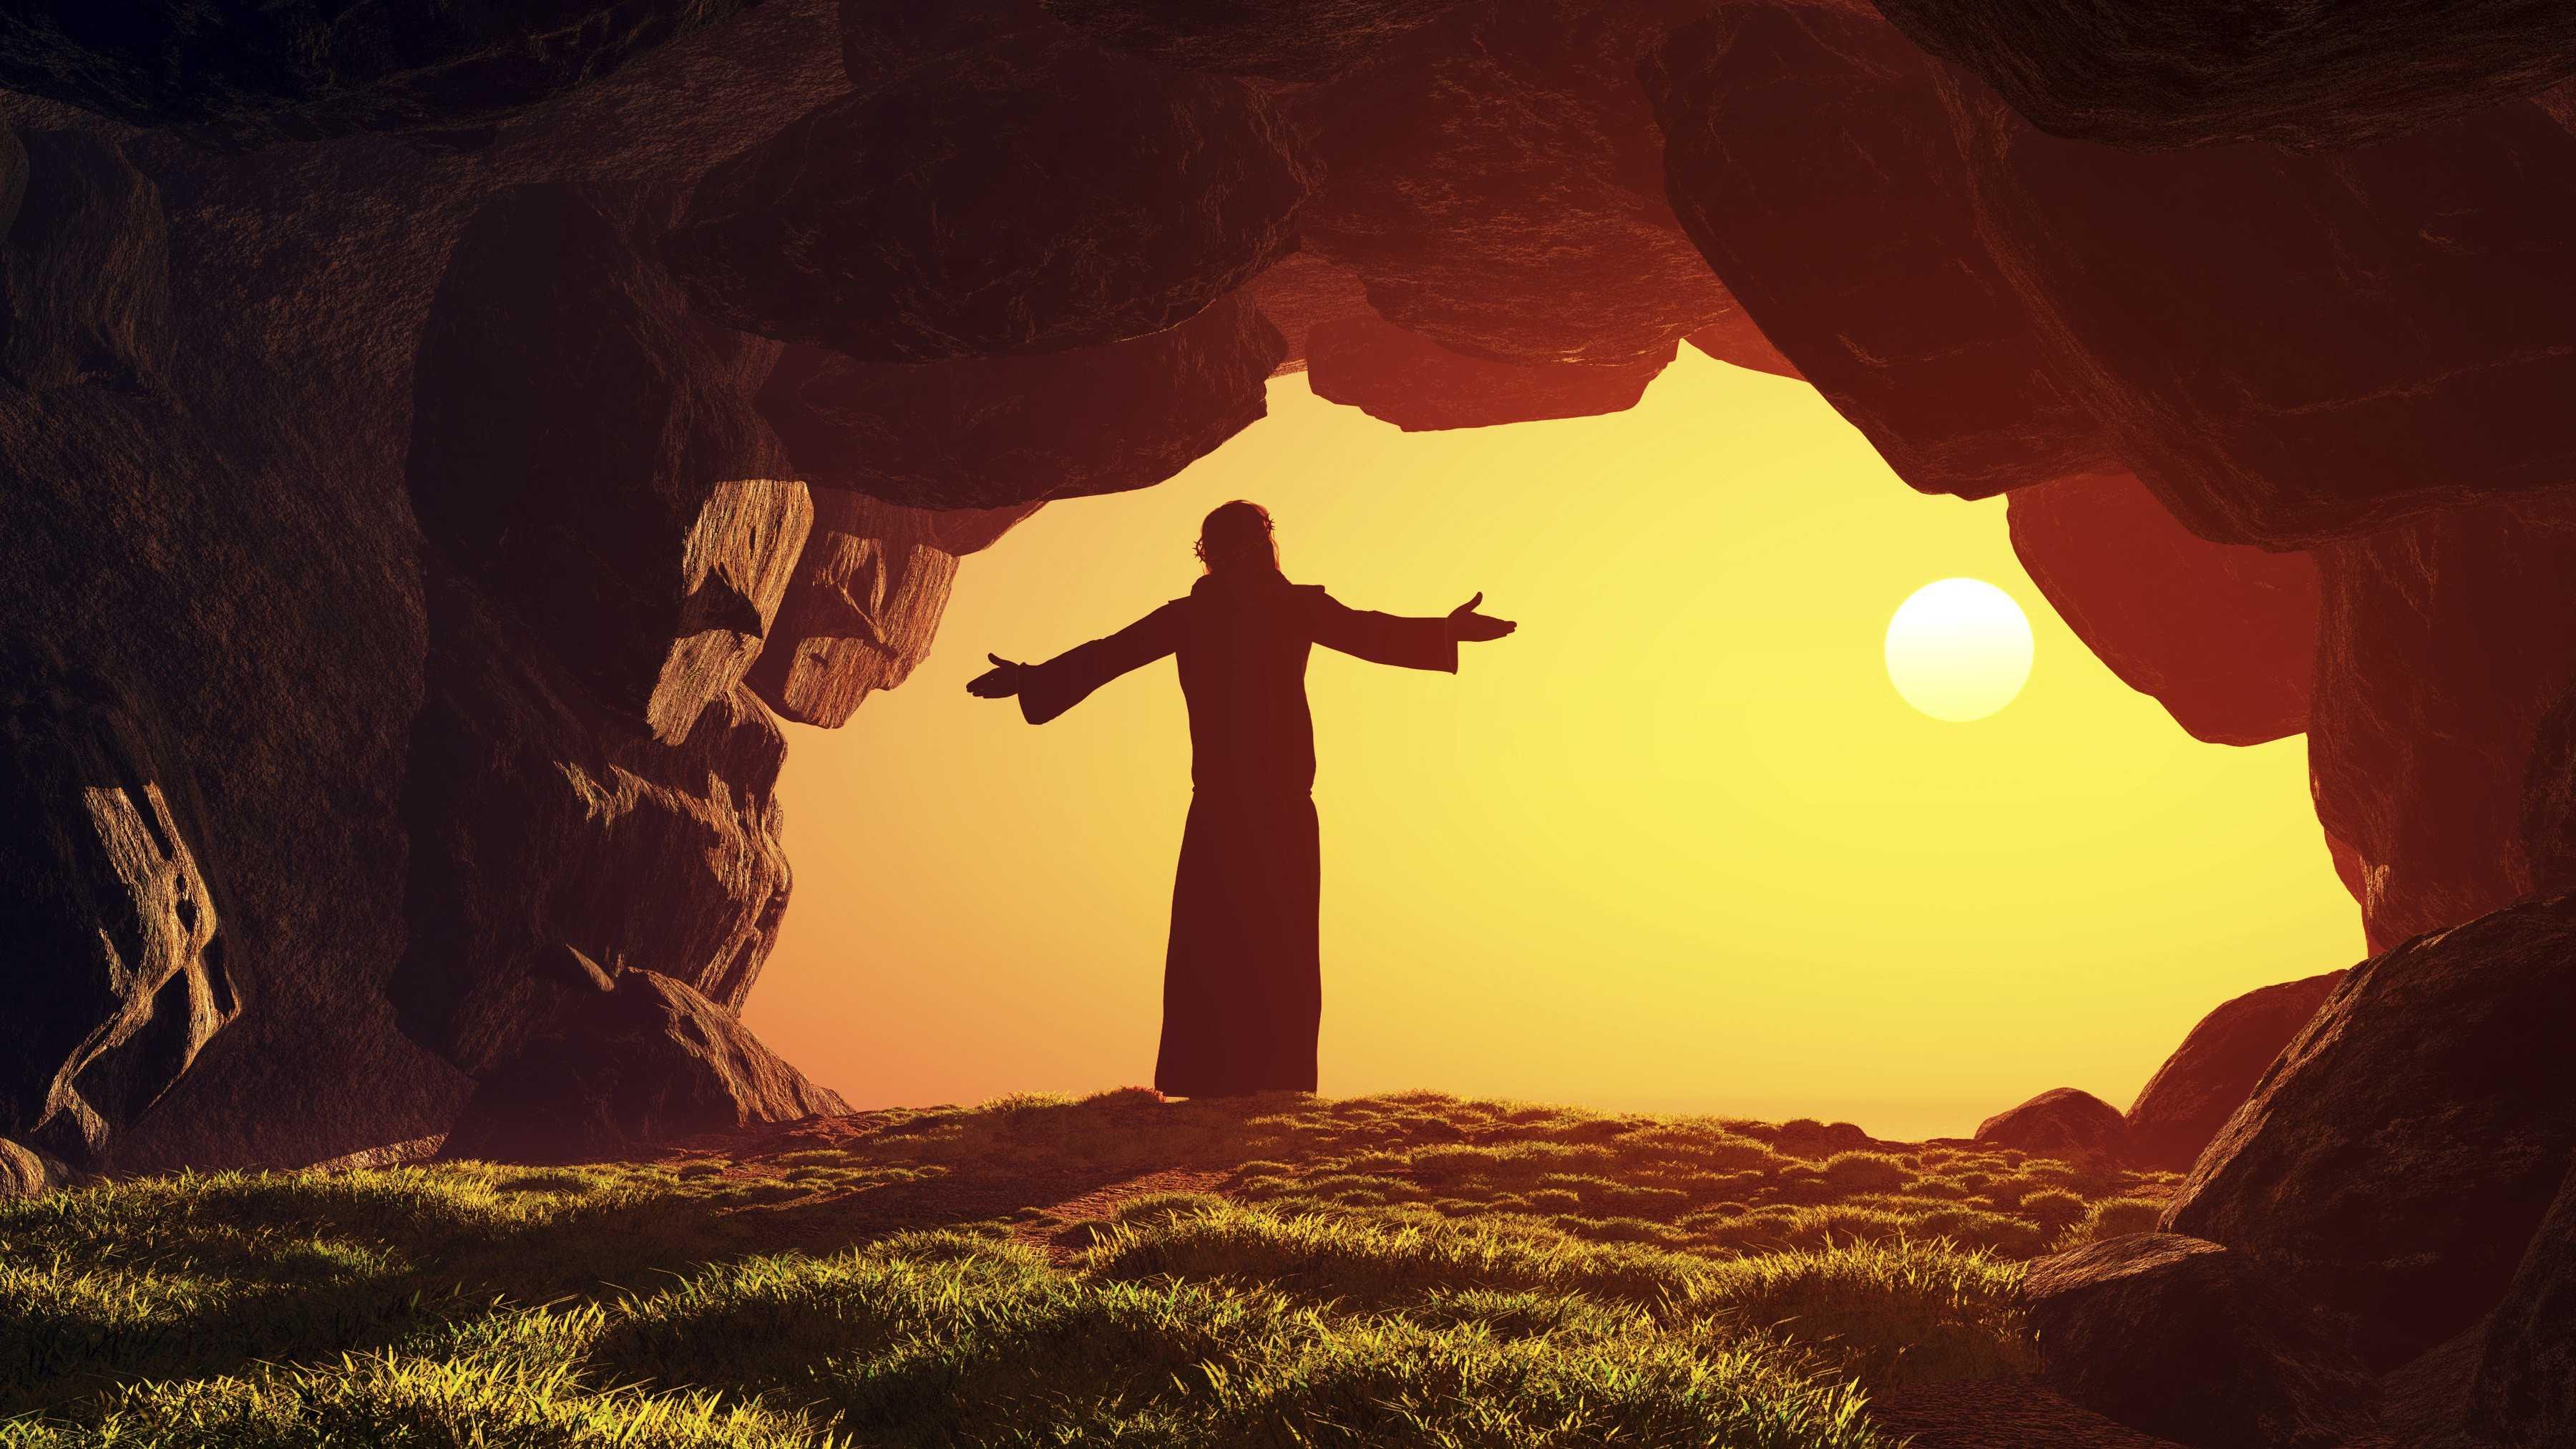 Jesus Christ HD Wallpapers 1080p - Wallpaper Cave